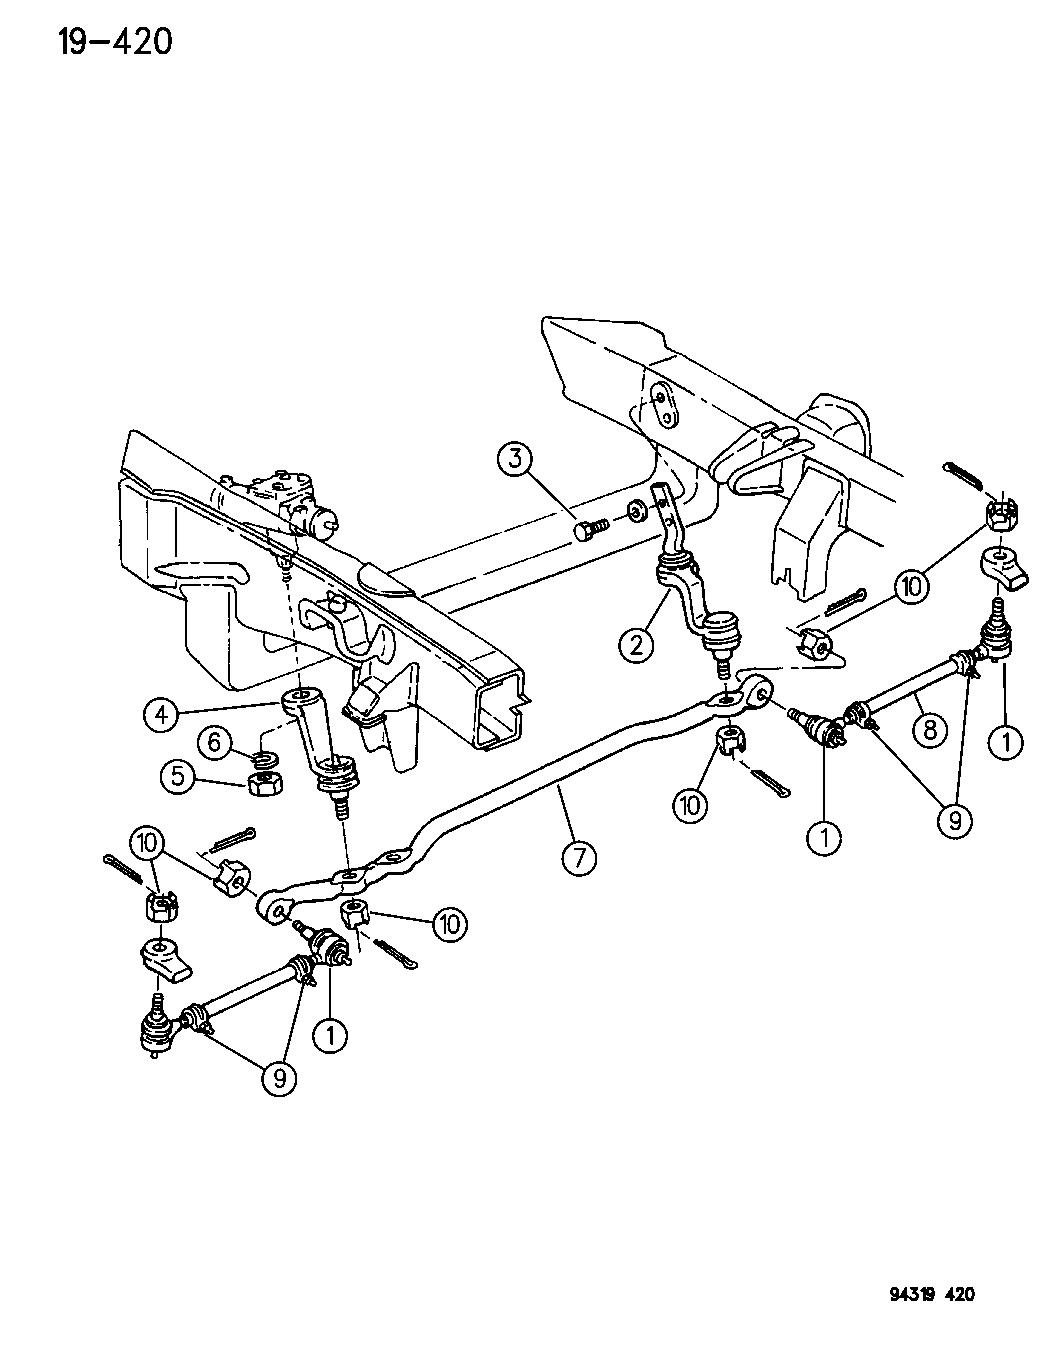 1994 Dodge Dakota Linkage, Steering - Mopar Parts Giant